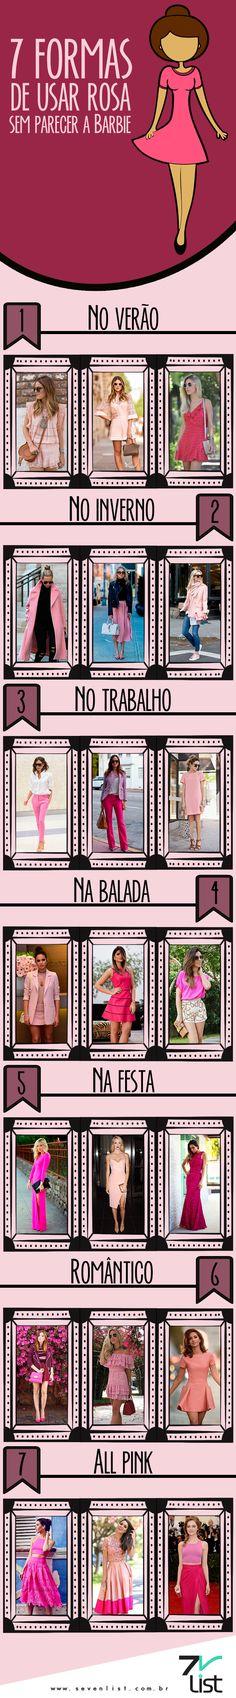 #Moda #Fashion #Pink #Rosa #SevenList #OutubroRosa #SevenList #Art #Design #Look #Outfit